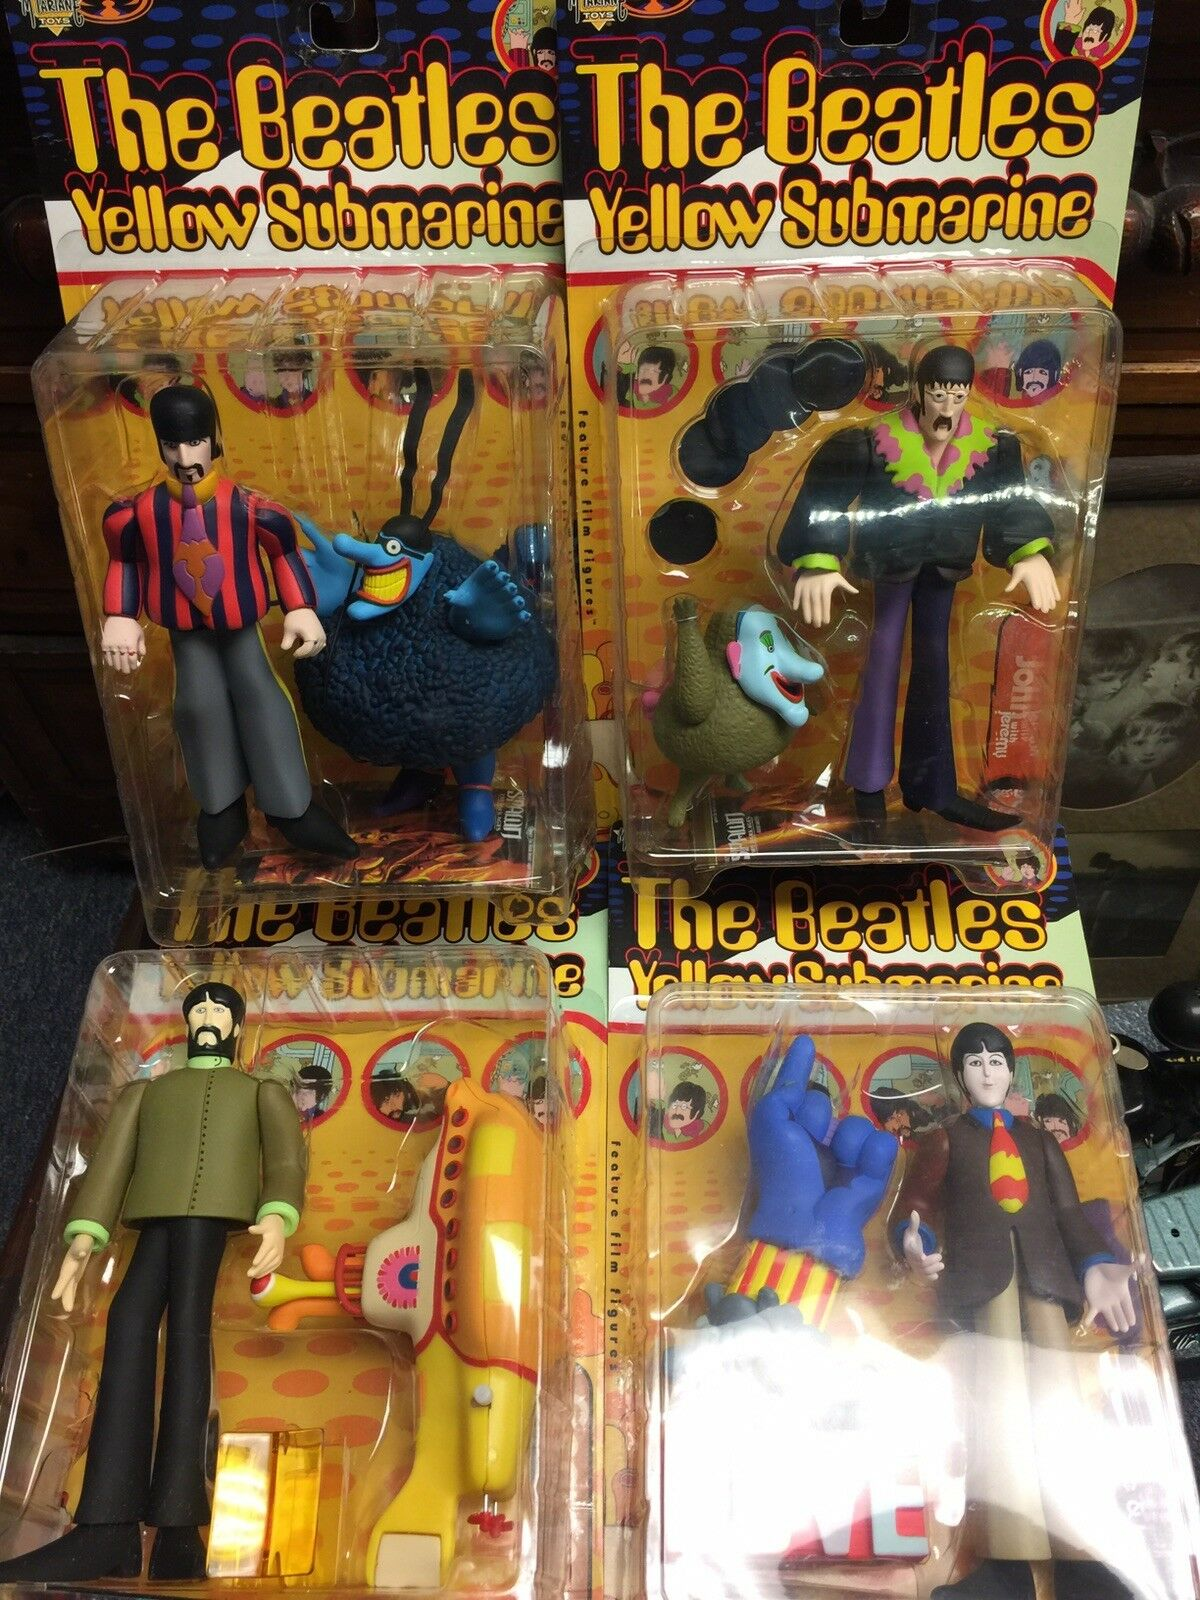 Beatles Gelb Submarine Figures - All Four - Unopened - 1999 - McFarlane Toys